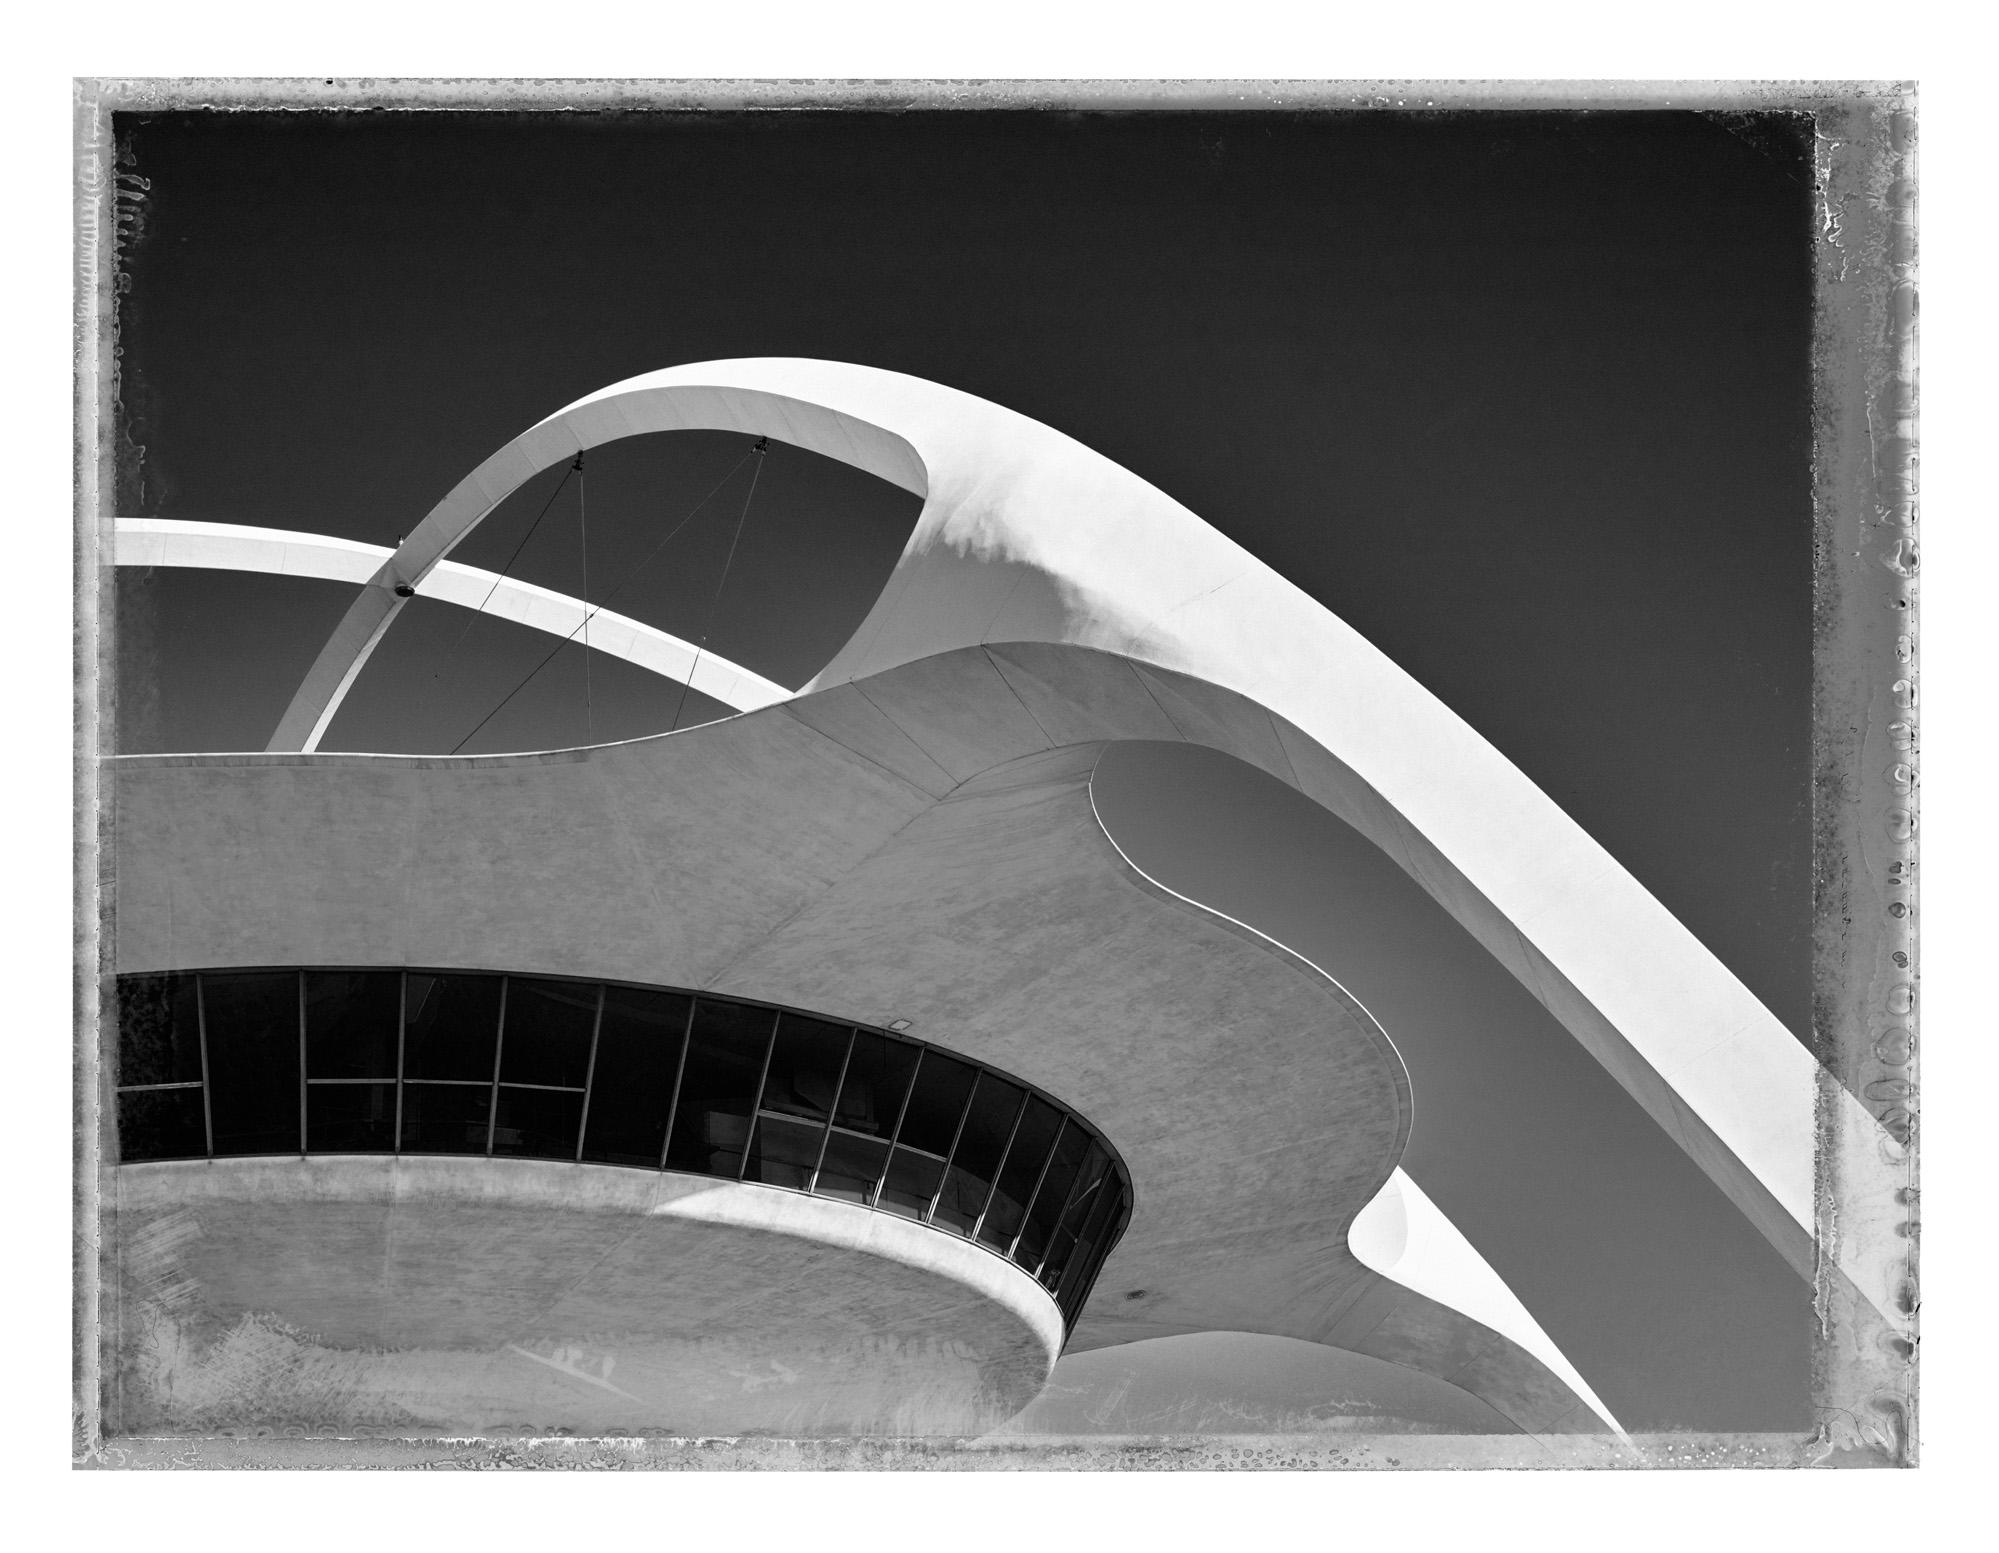 09_Theme_Building_II.jpg